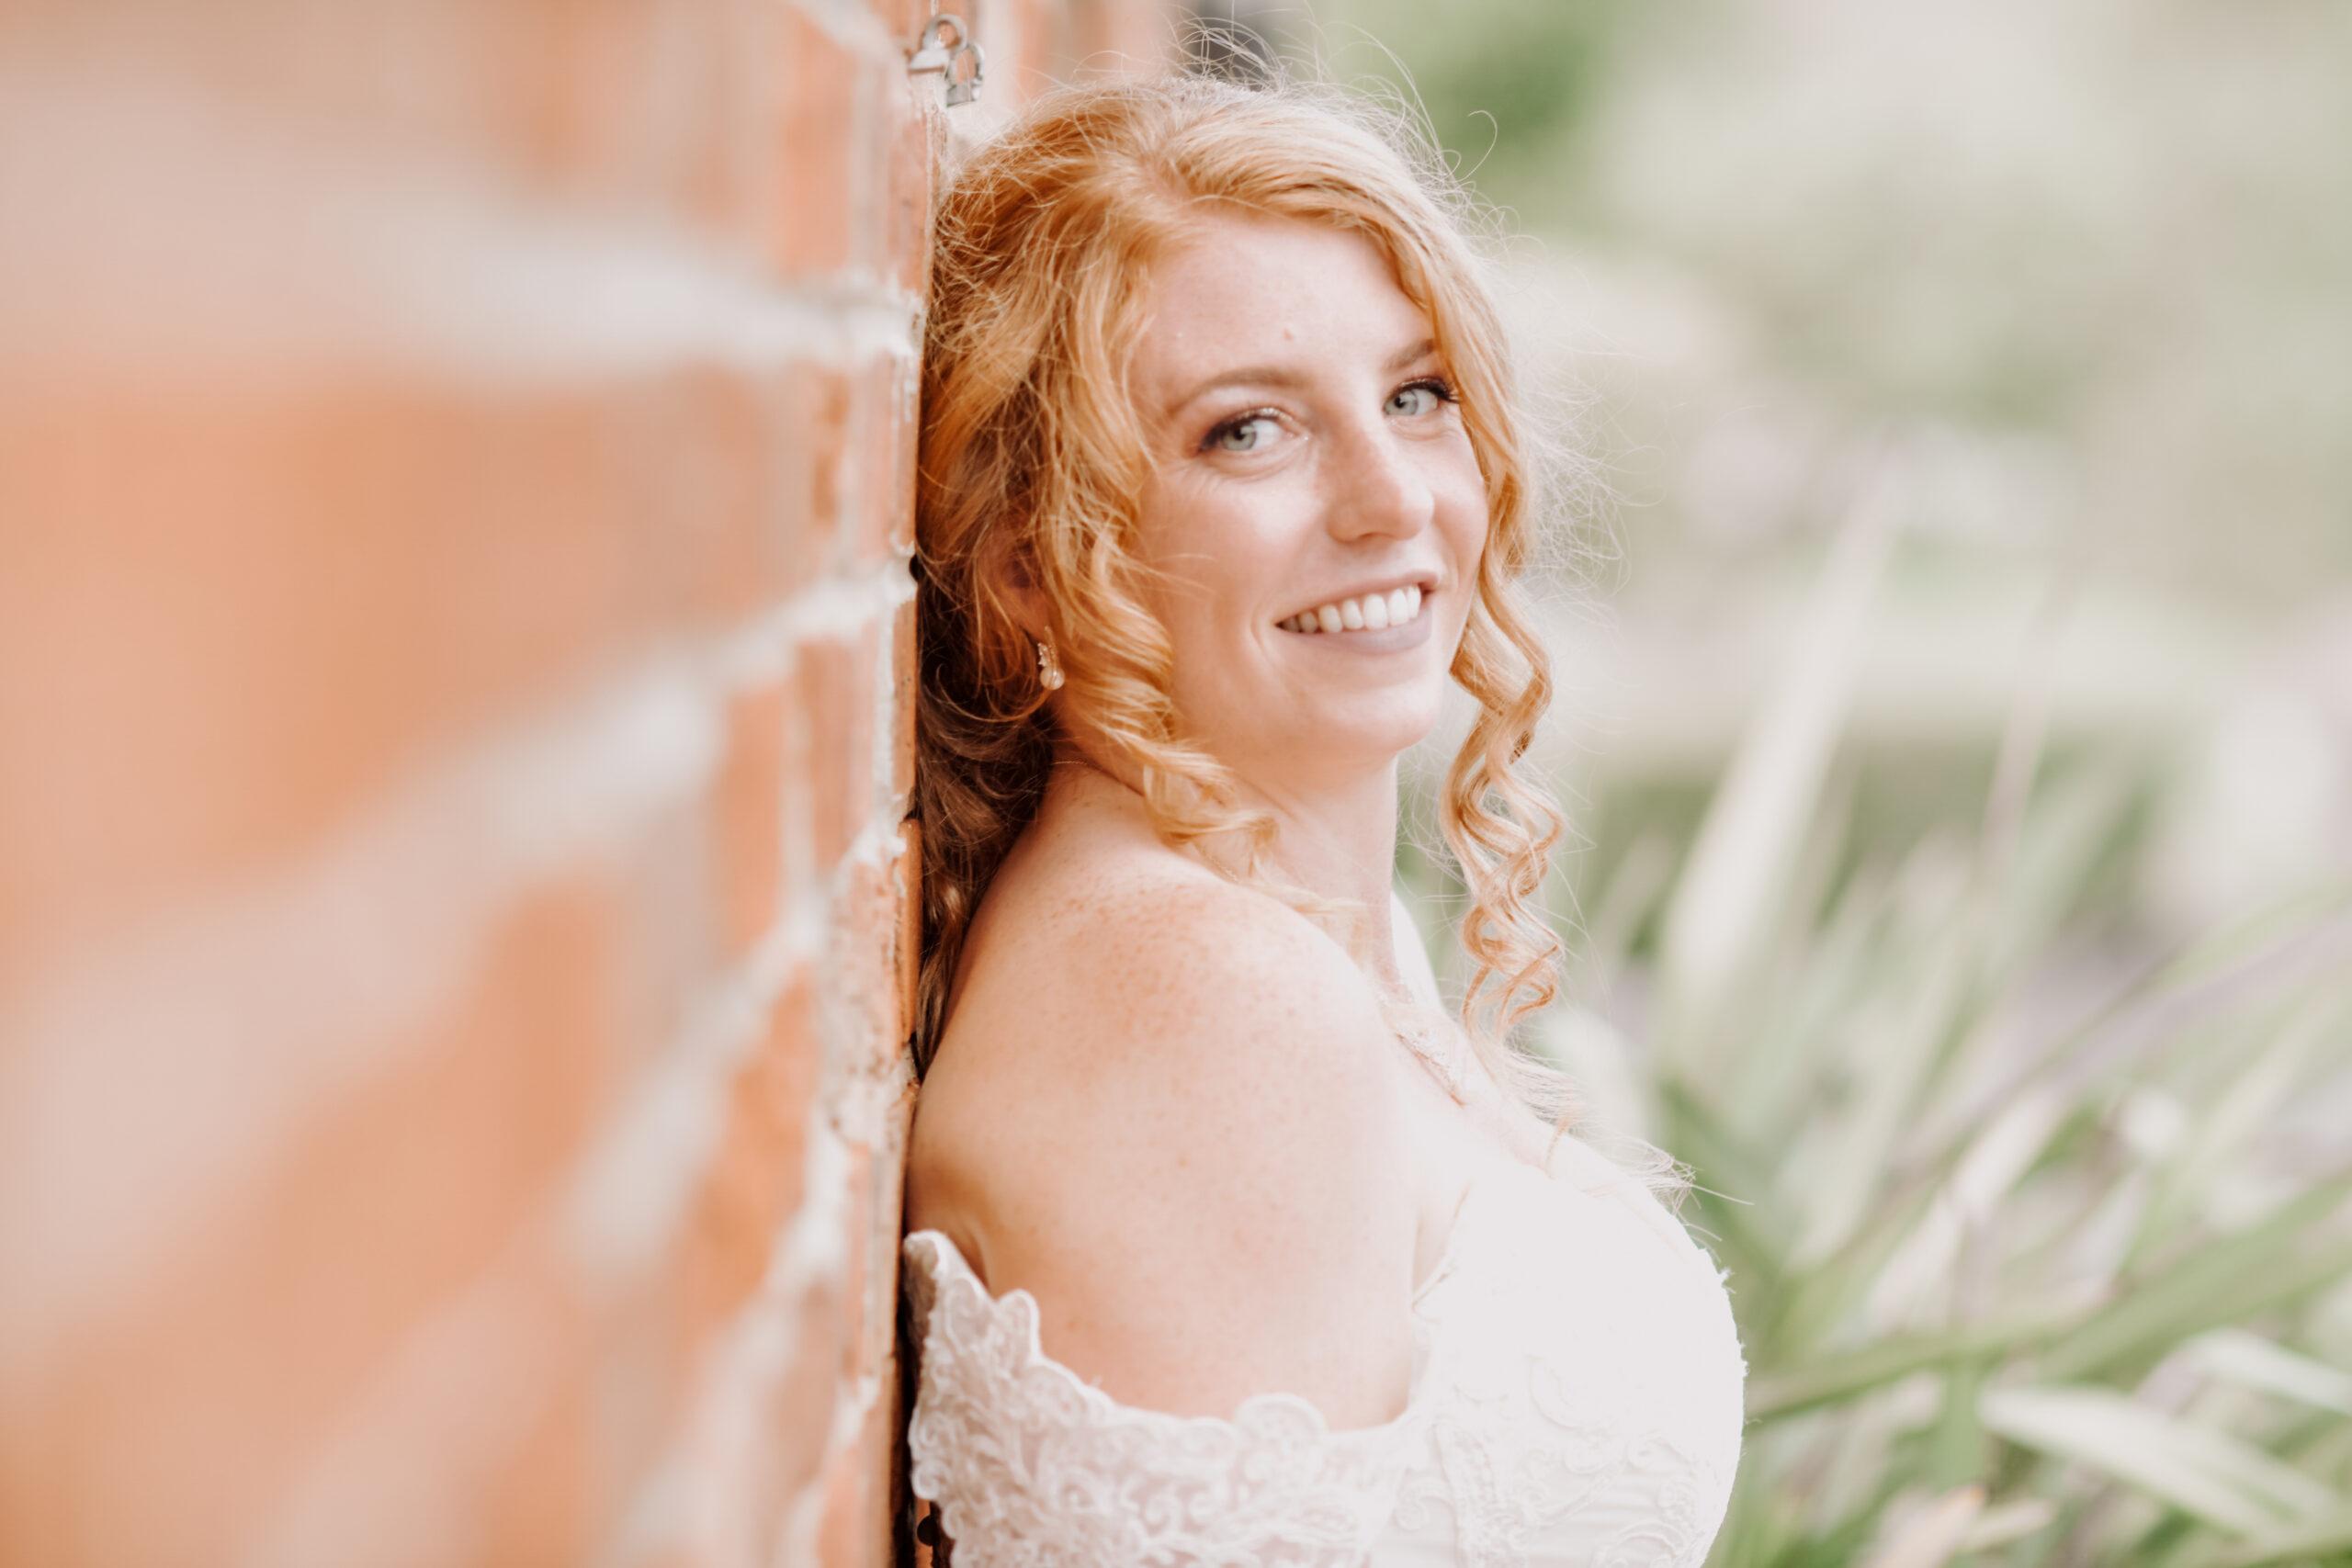 Wedding Photos at Wootton Park